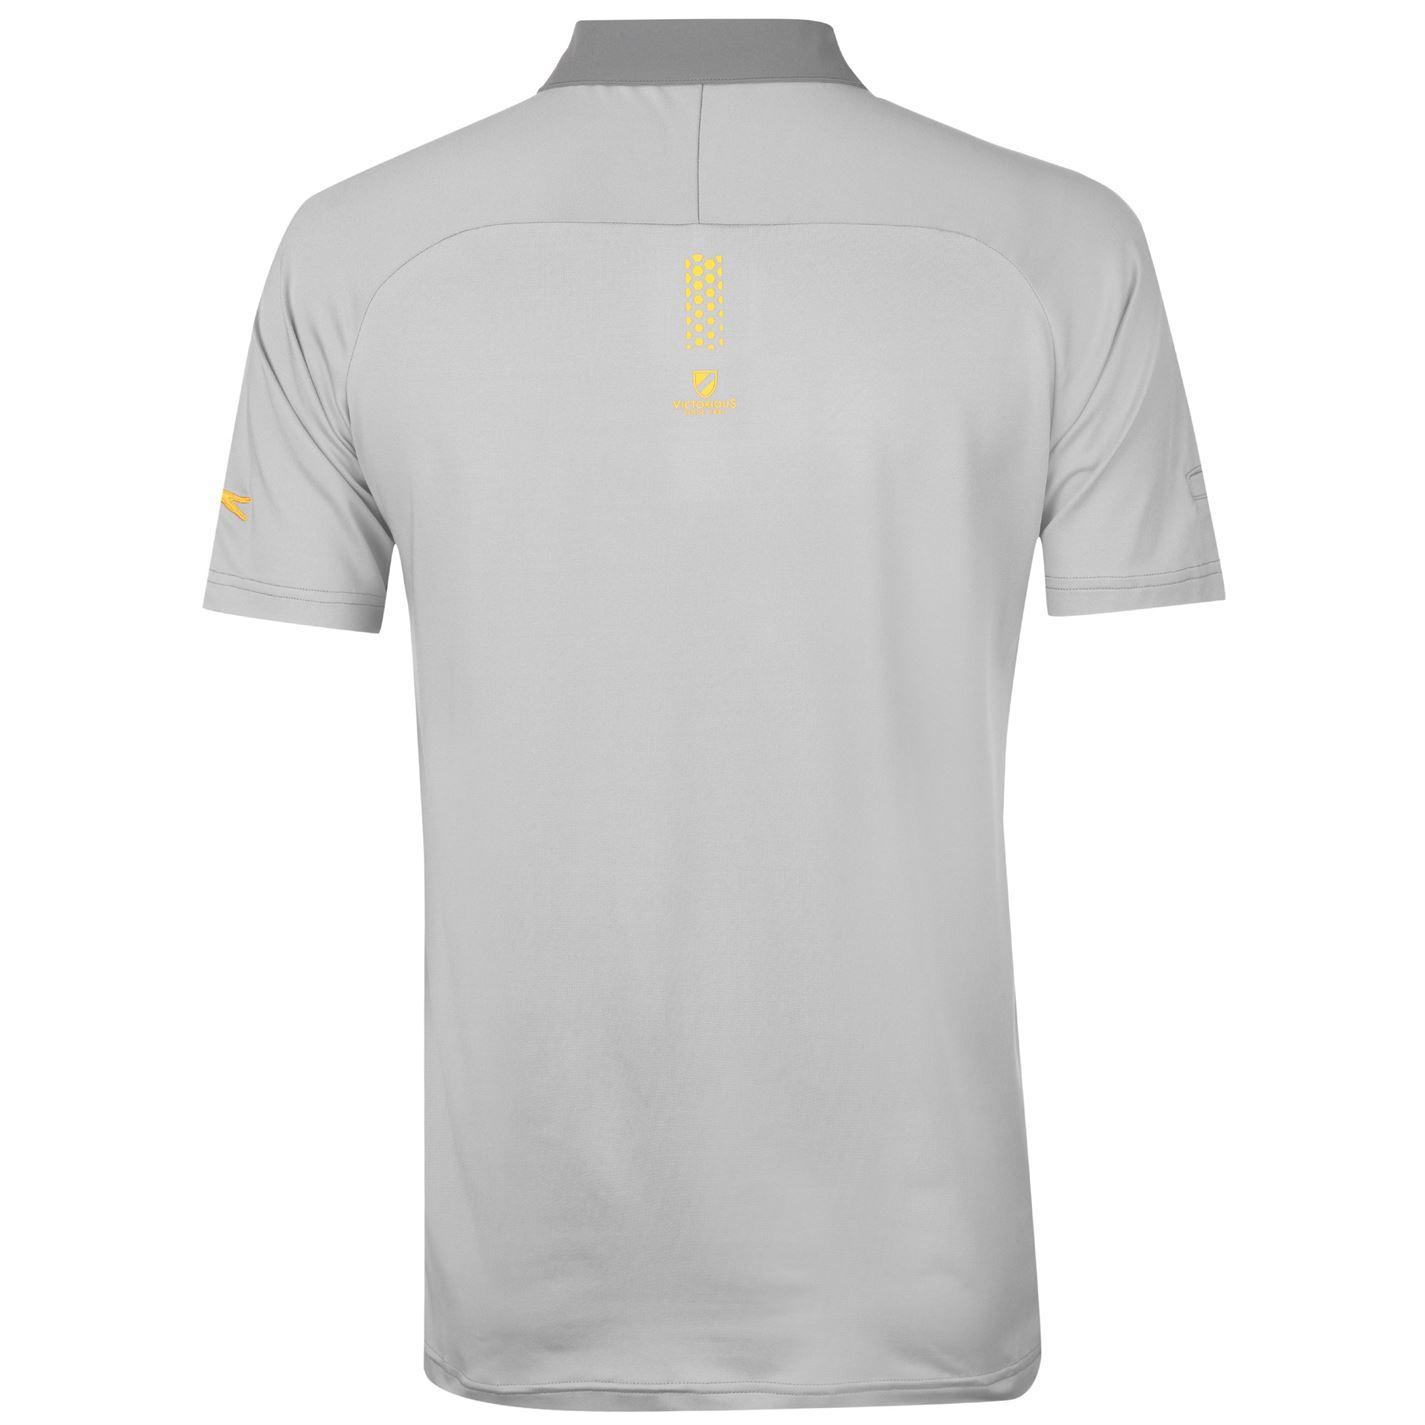 Slazenger Performance Striped Polo Shirt Mens Gents Short Sleeve Tee Top